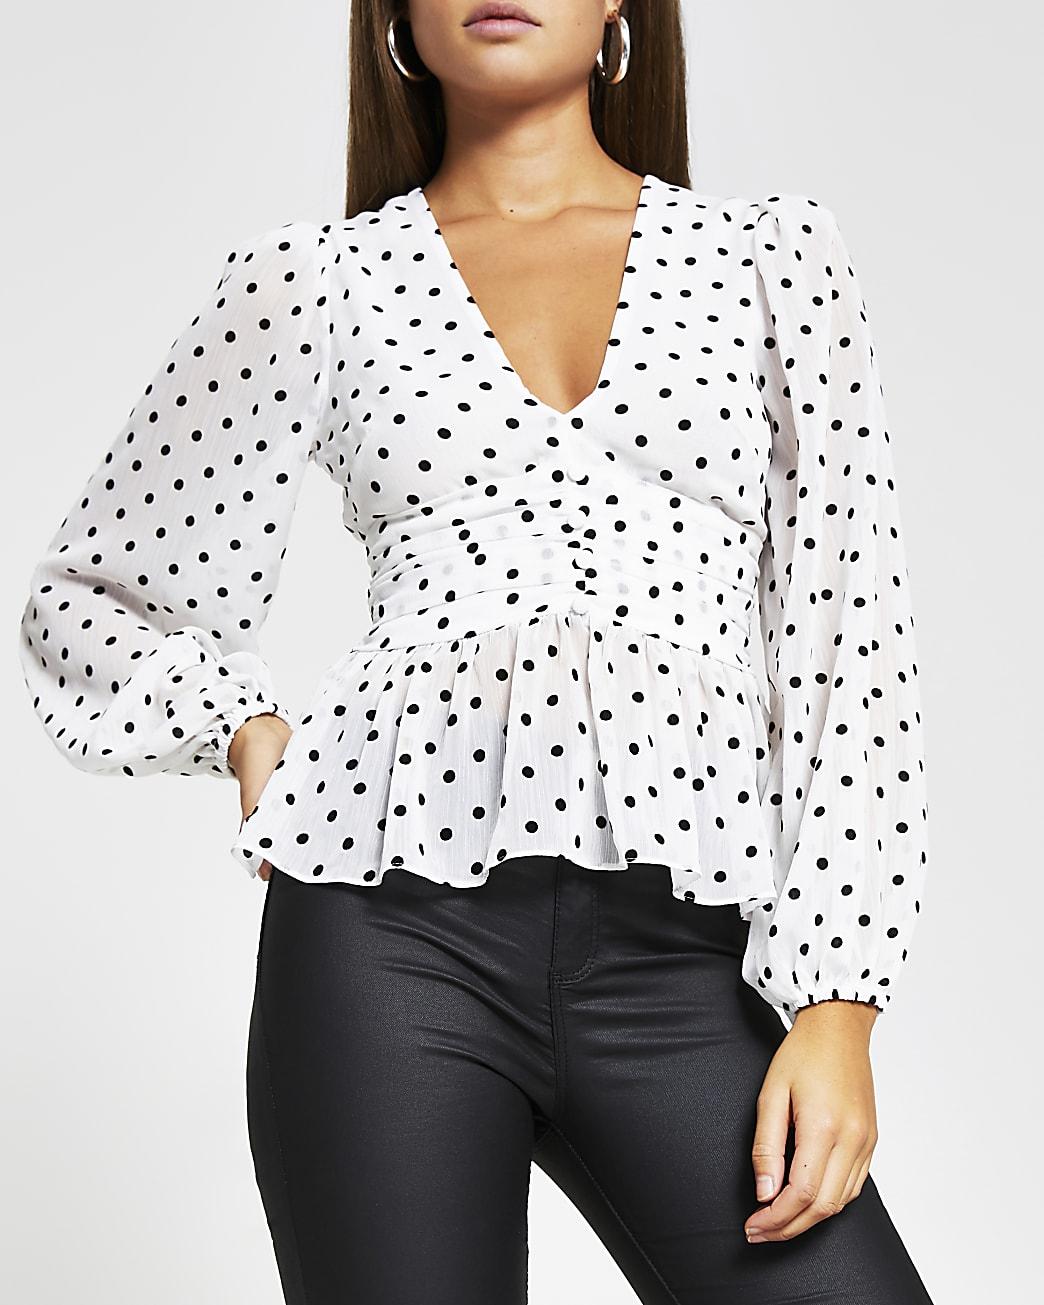 White spot print long sleeve blouse top